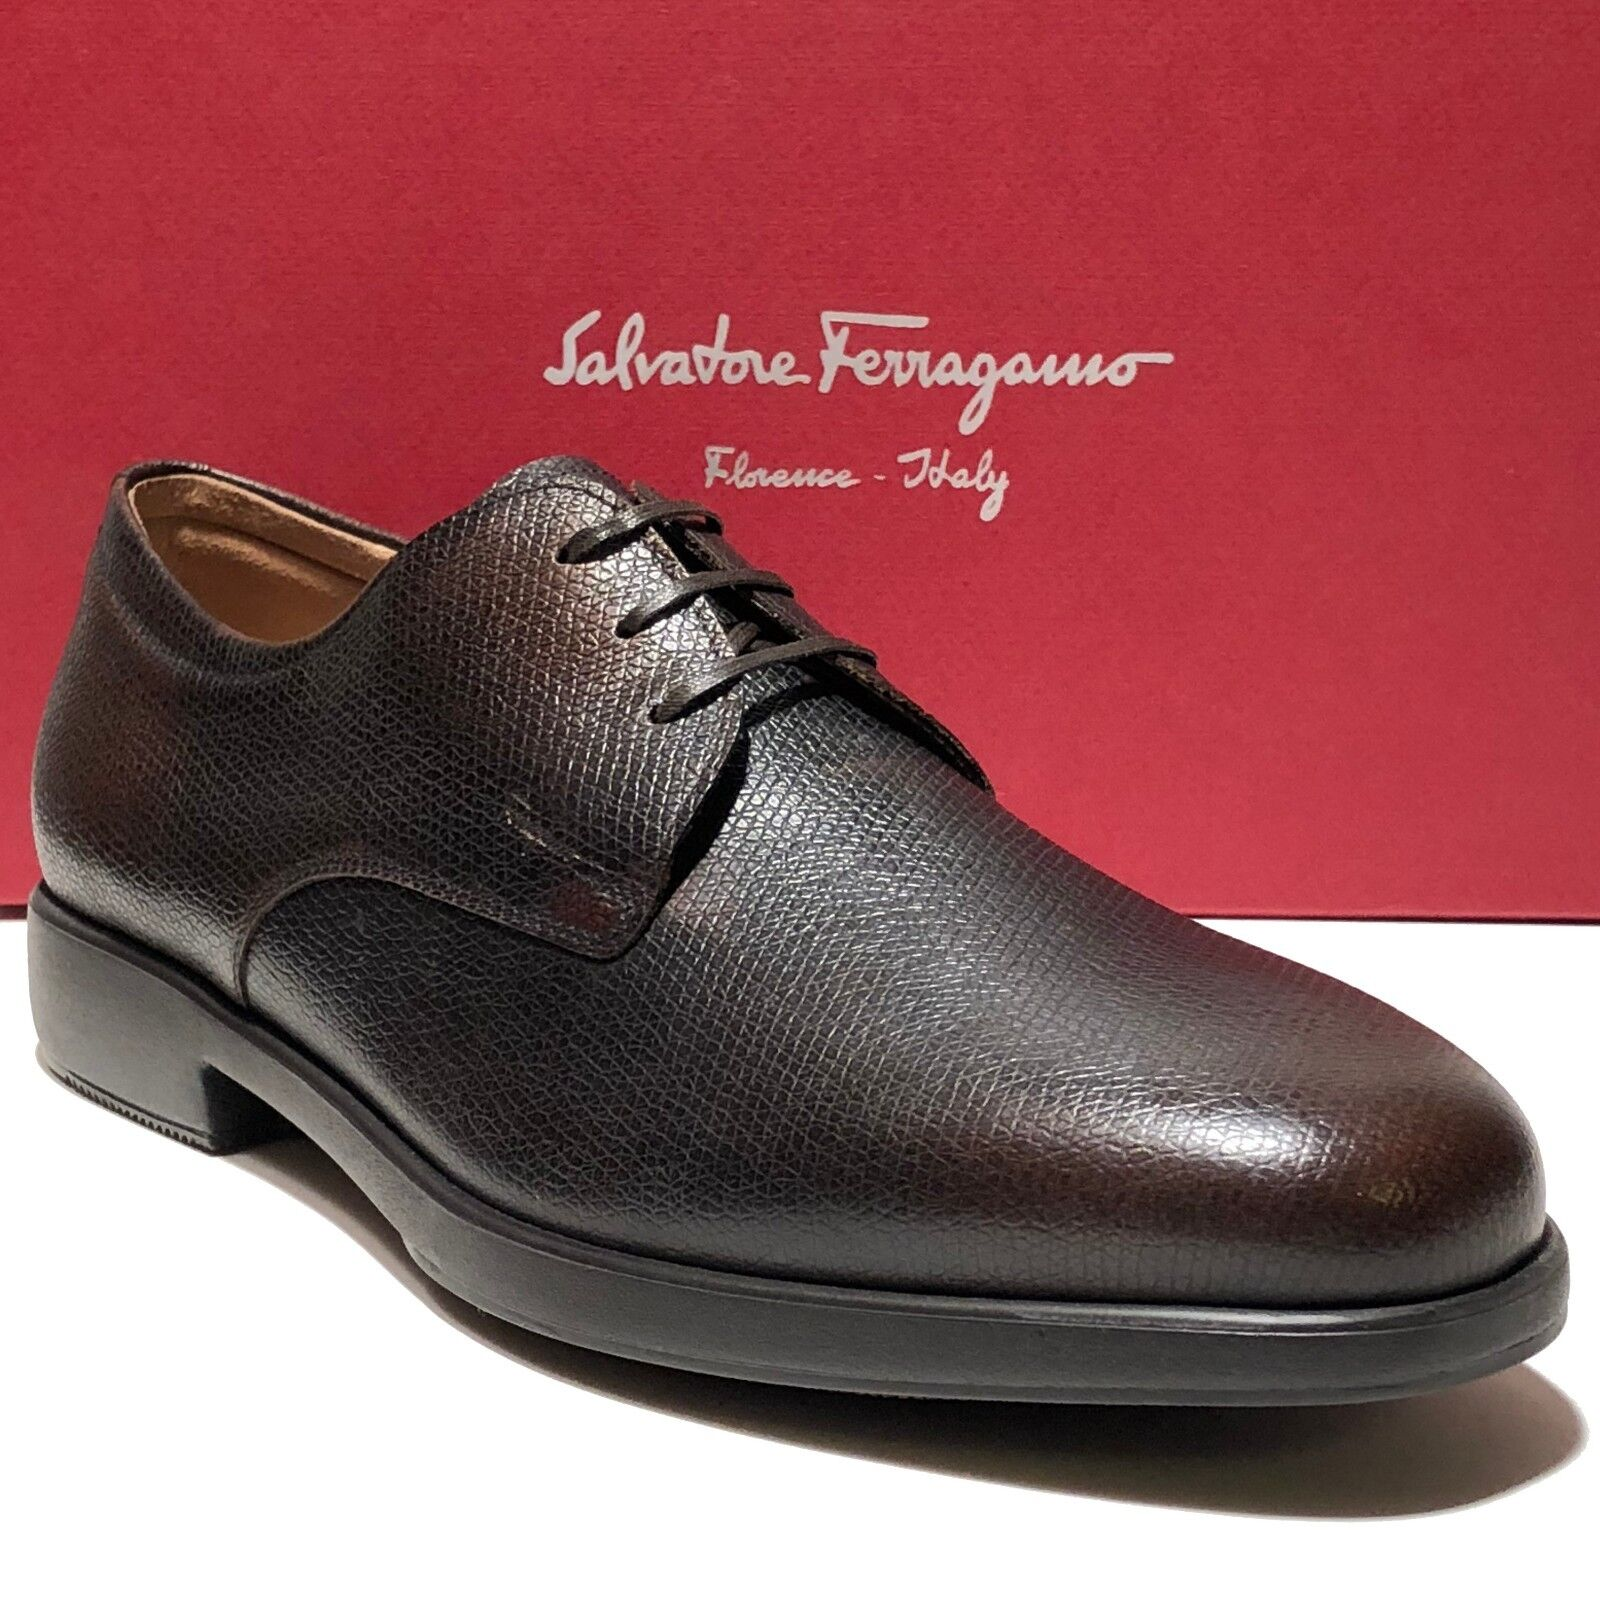 Ferragamo Marron 8.5 Ee Homme Galets Cuir Habillé Oxford   Chaussures